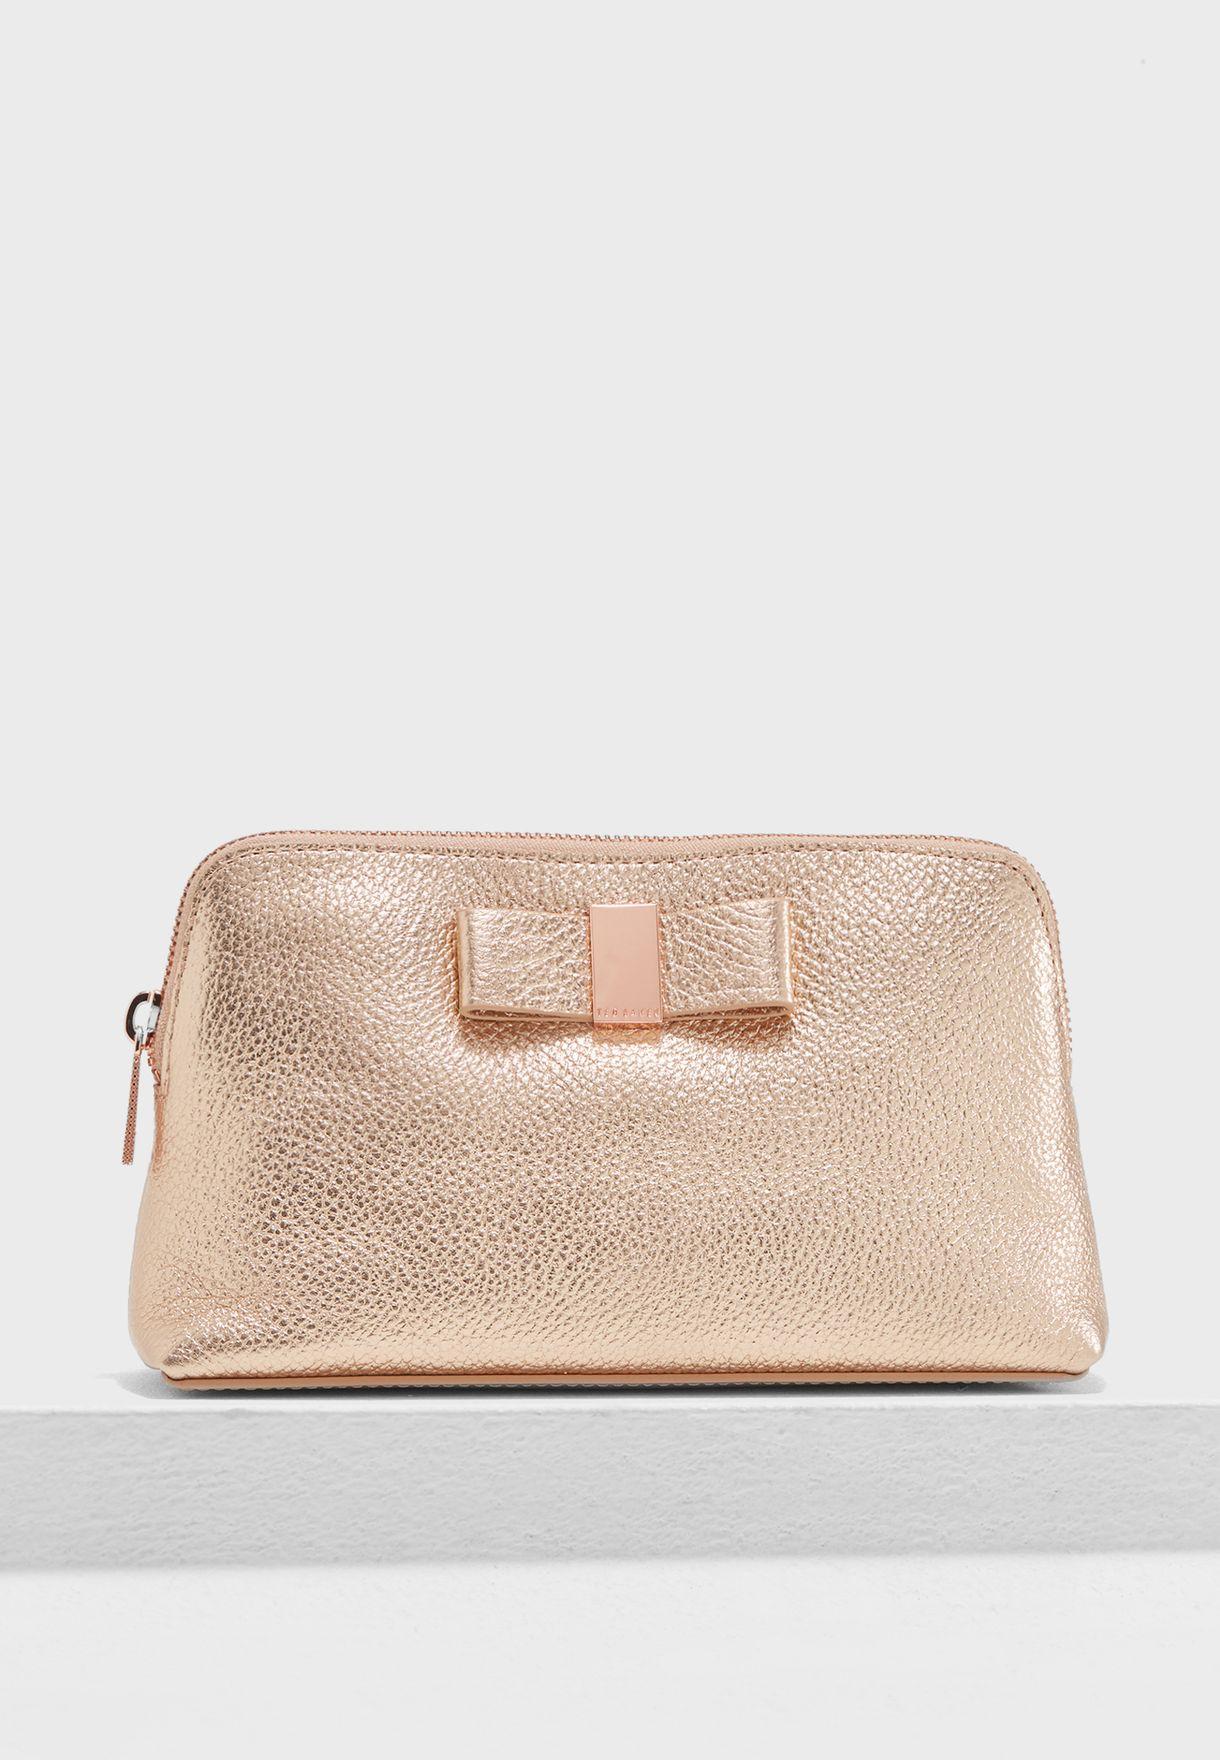 59a0fe0e31 Shop Ted baker gold Dennis Bow Leather Makeup Bag 146996 for Women ...